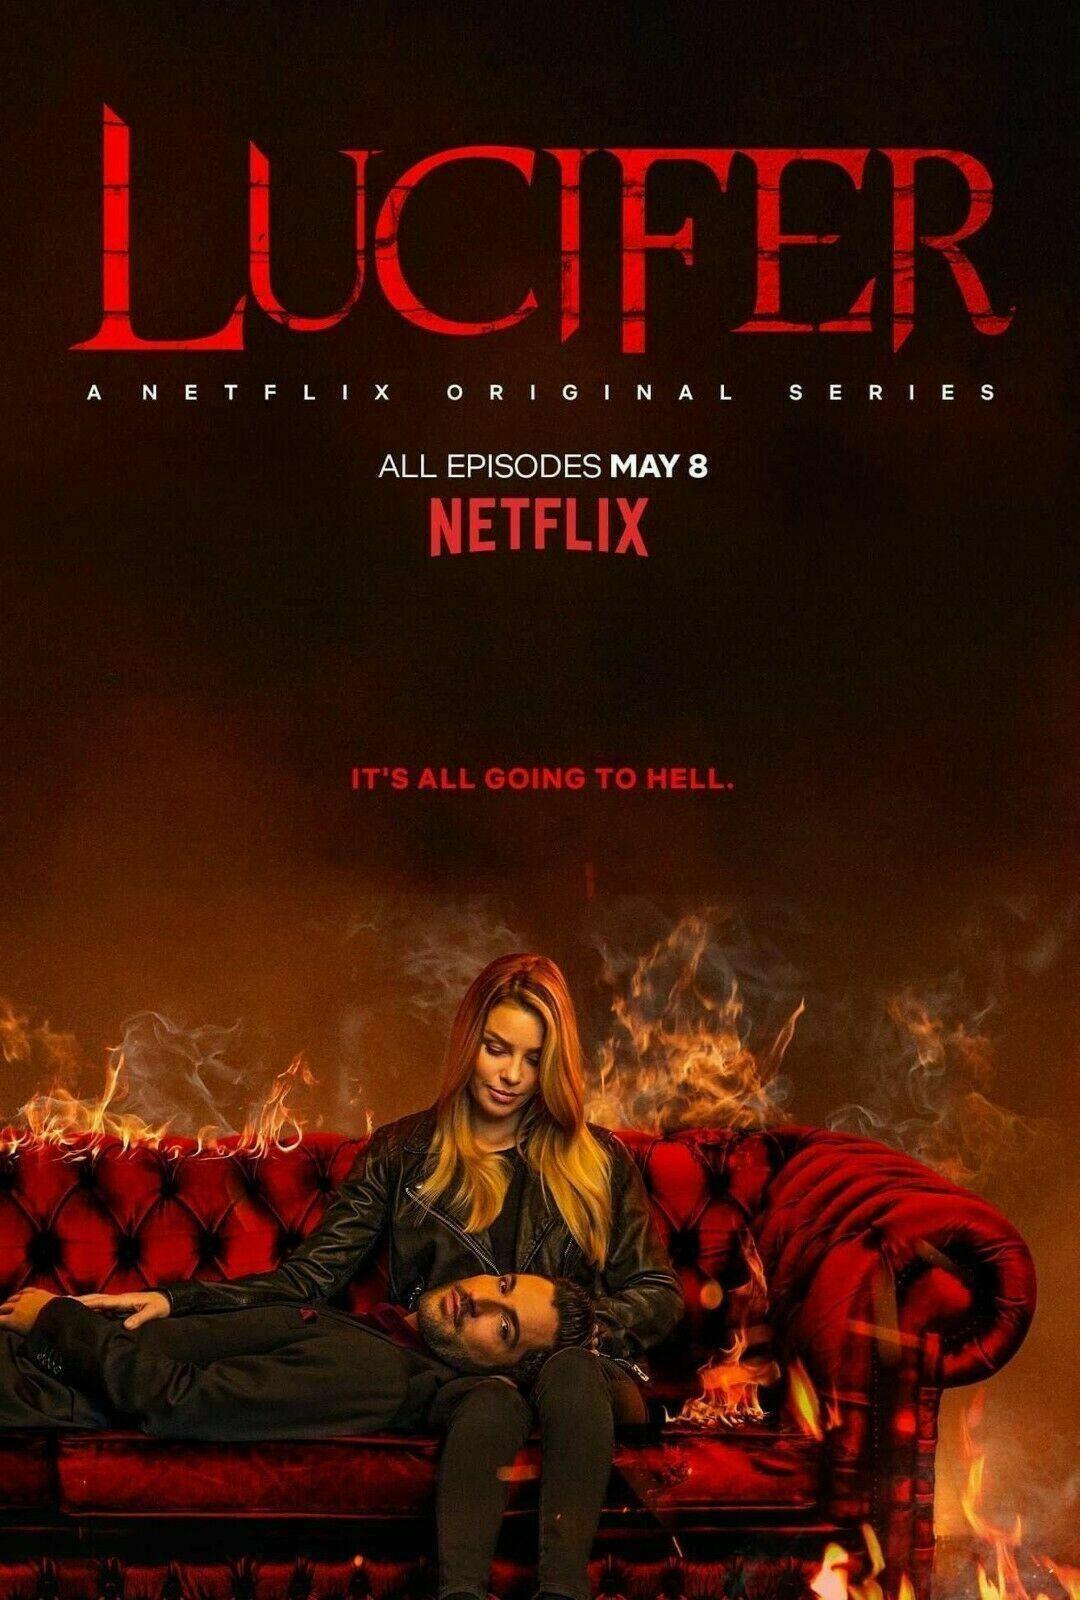 Lucifer Netflix Download Complete Season 1 4 Dual Audio Hindi English Bluray Hd 720p 480p In 2020 Lucifer Morningstar Lucifer Tom Ellis